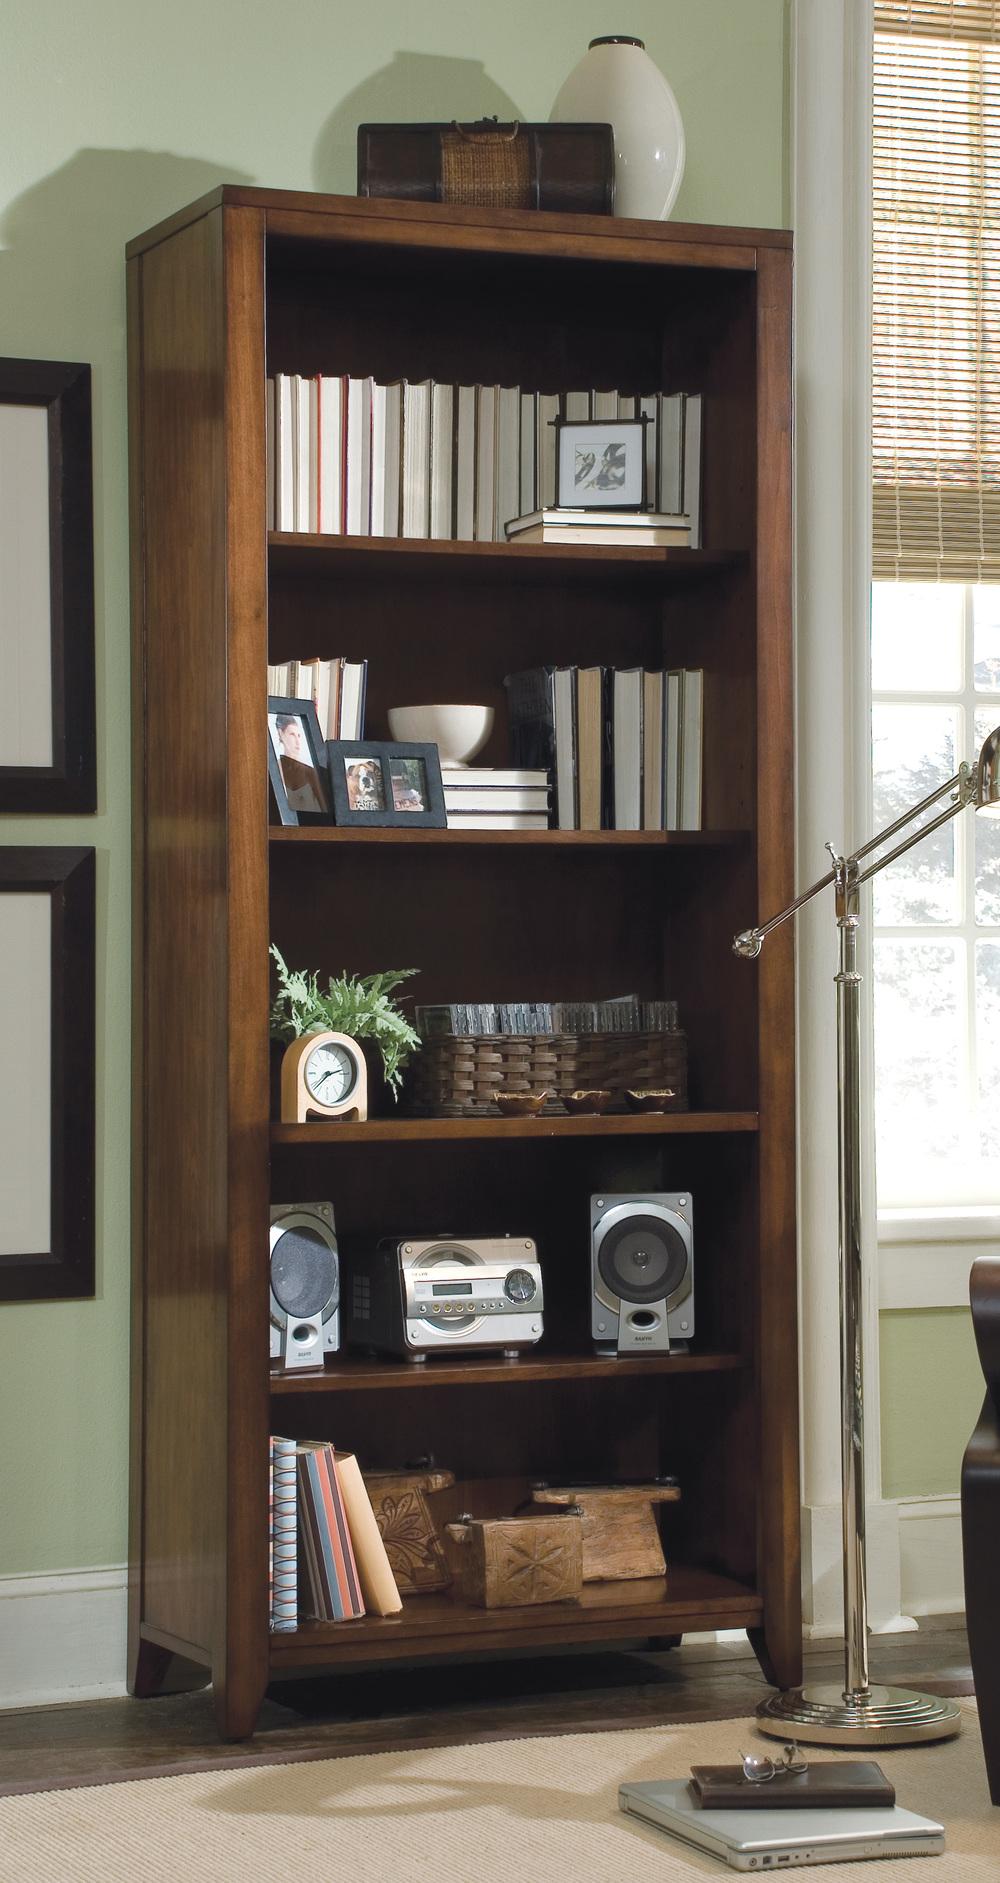 Hooker Furniture - Danforth Tall Bookcase